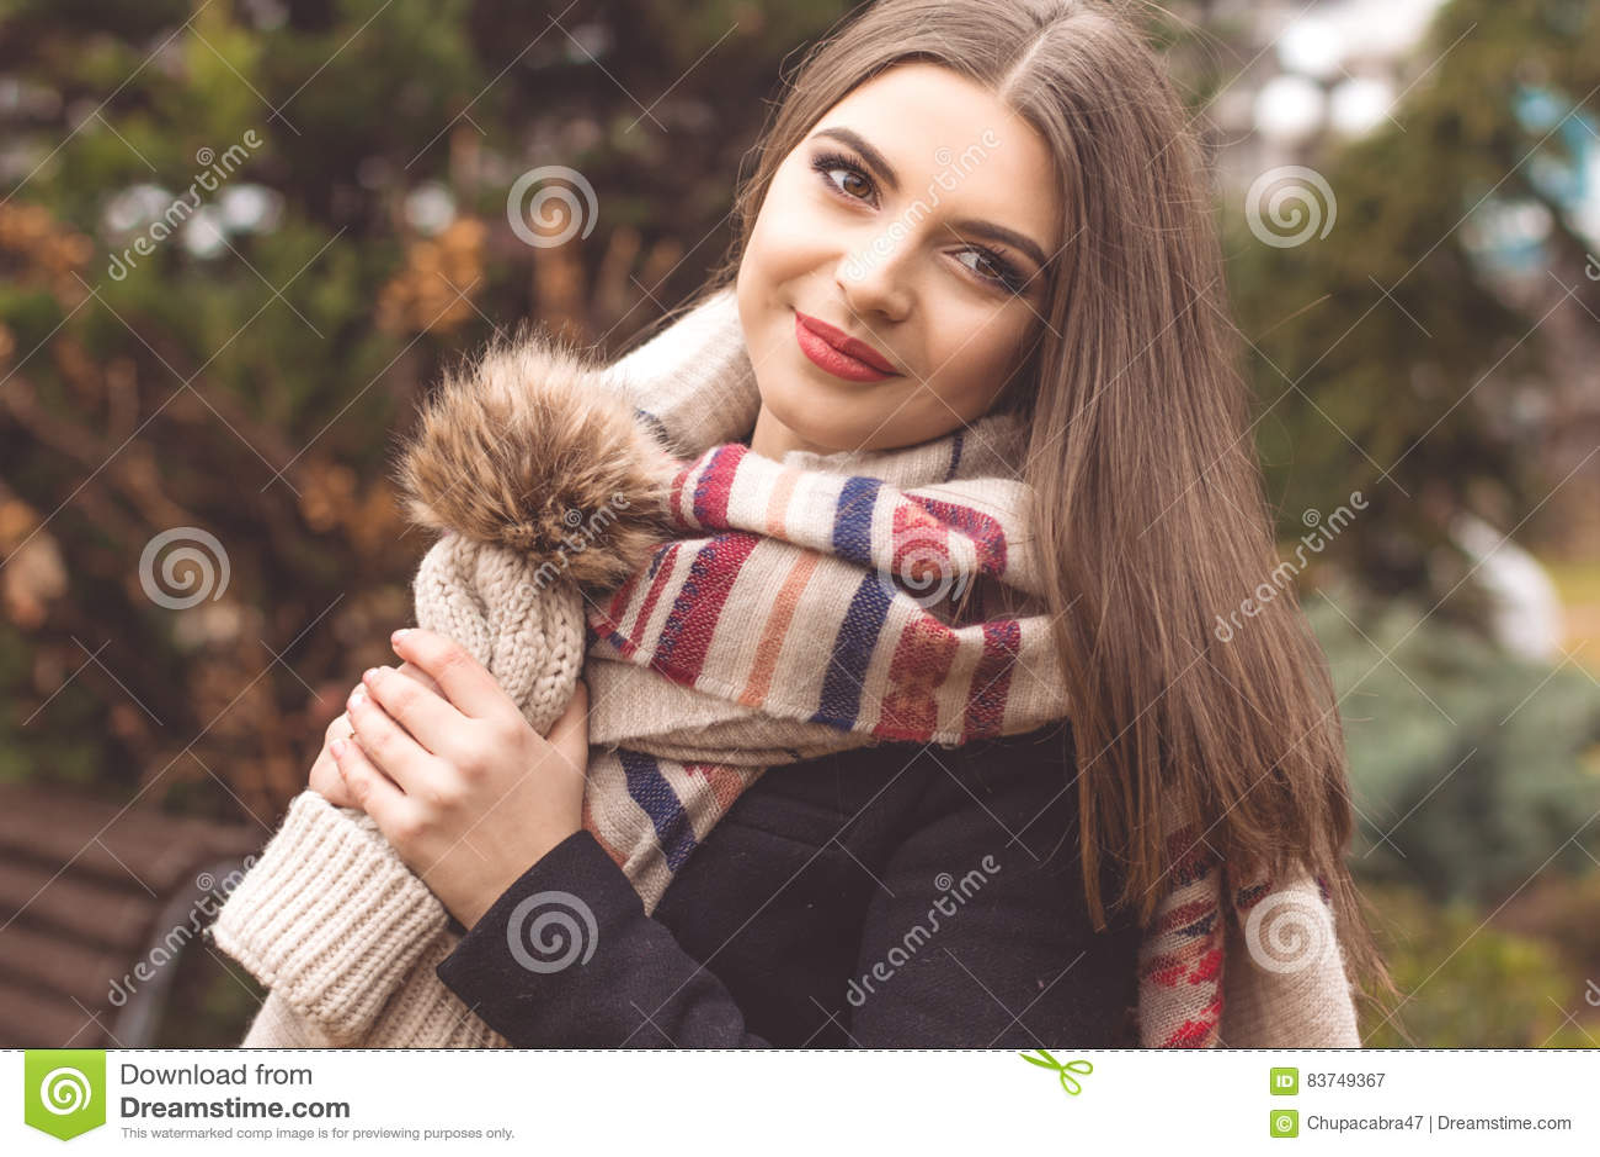 Chaud adolescent fille photos